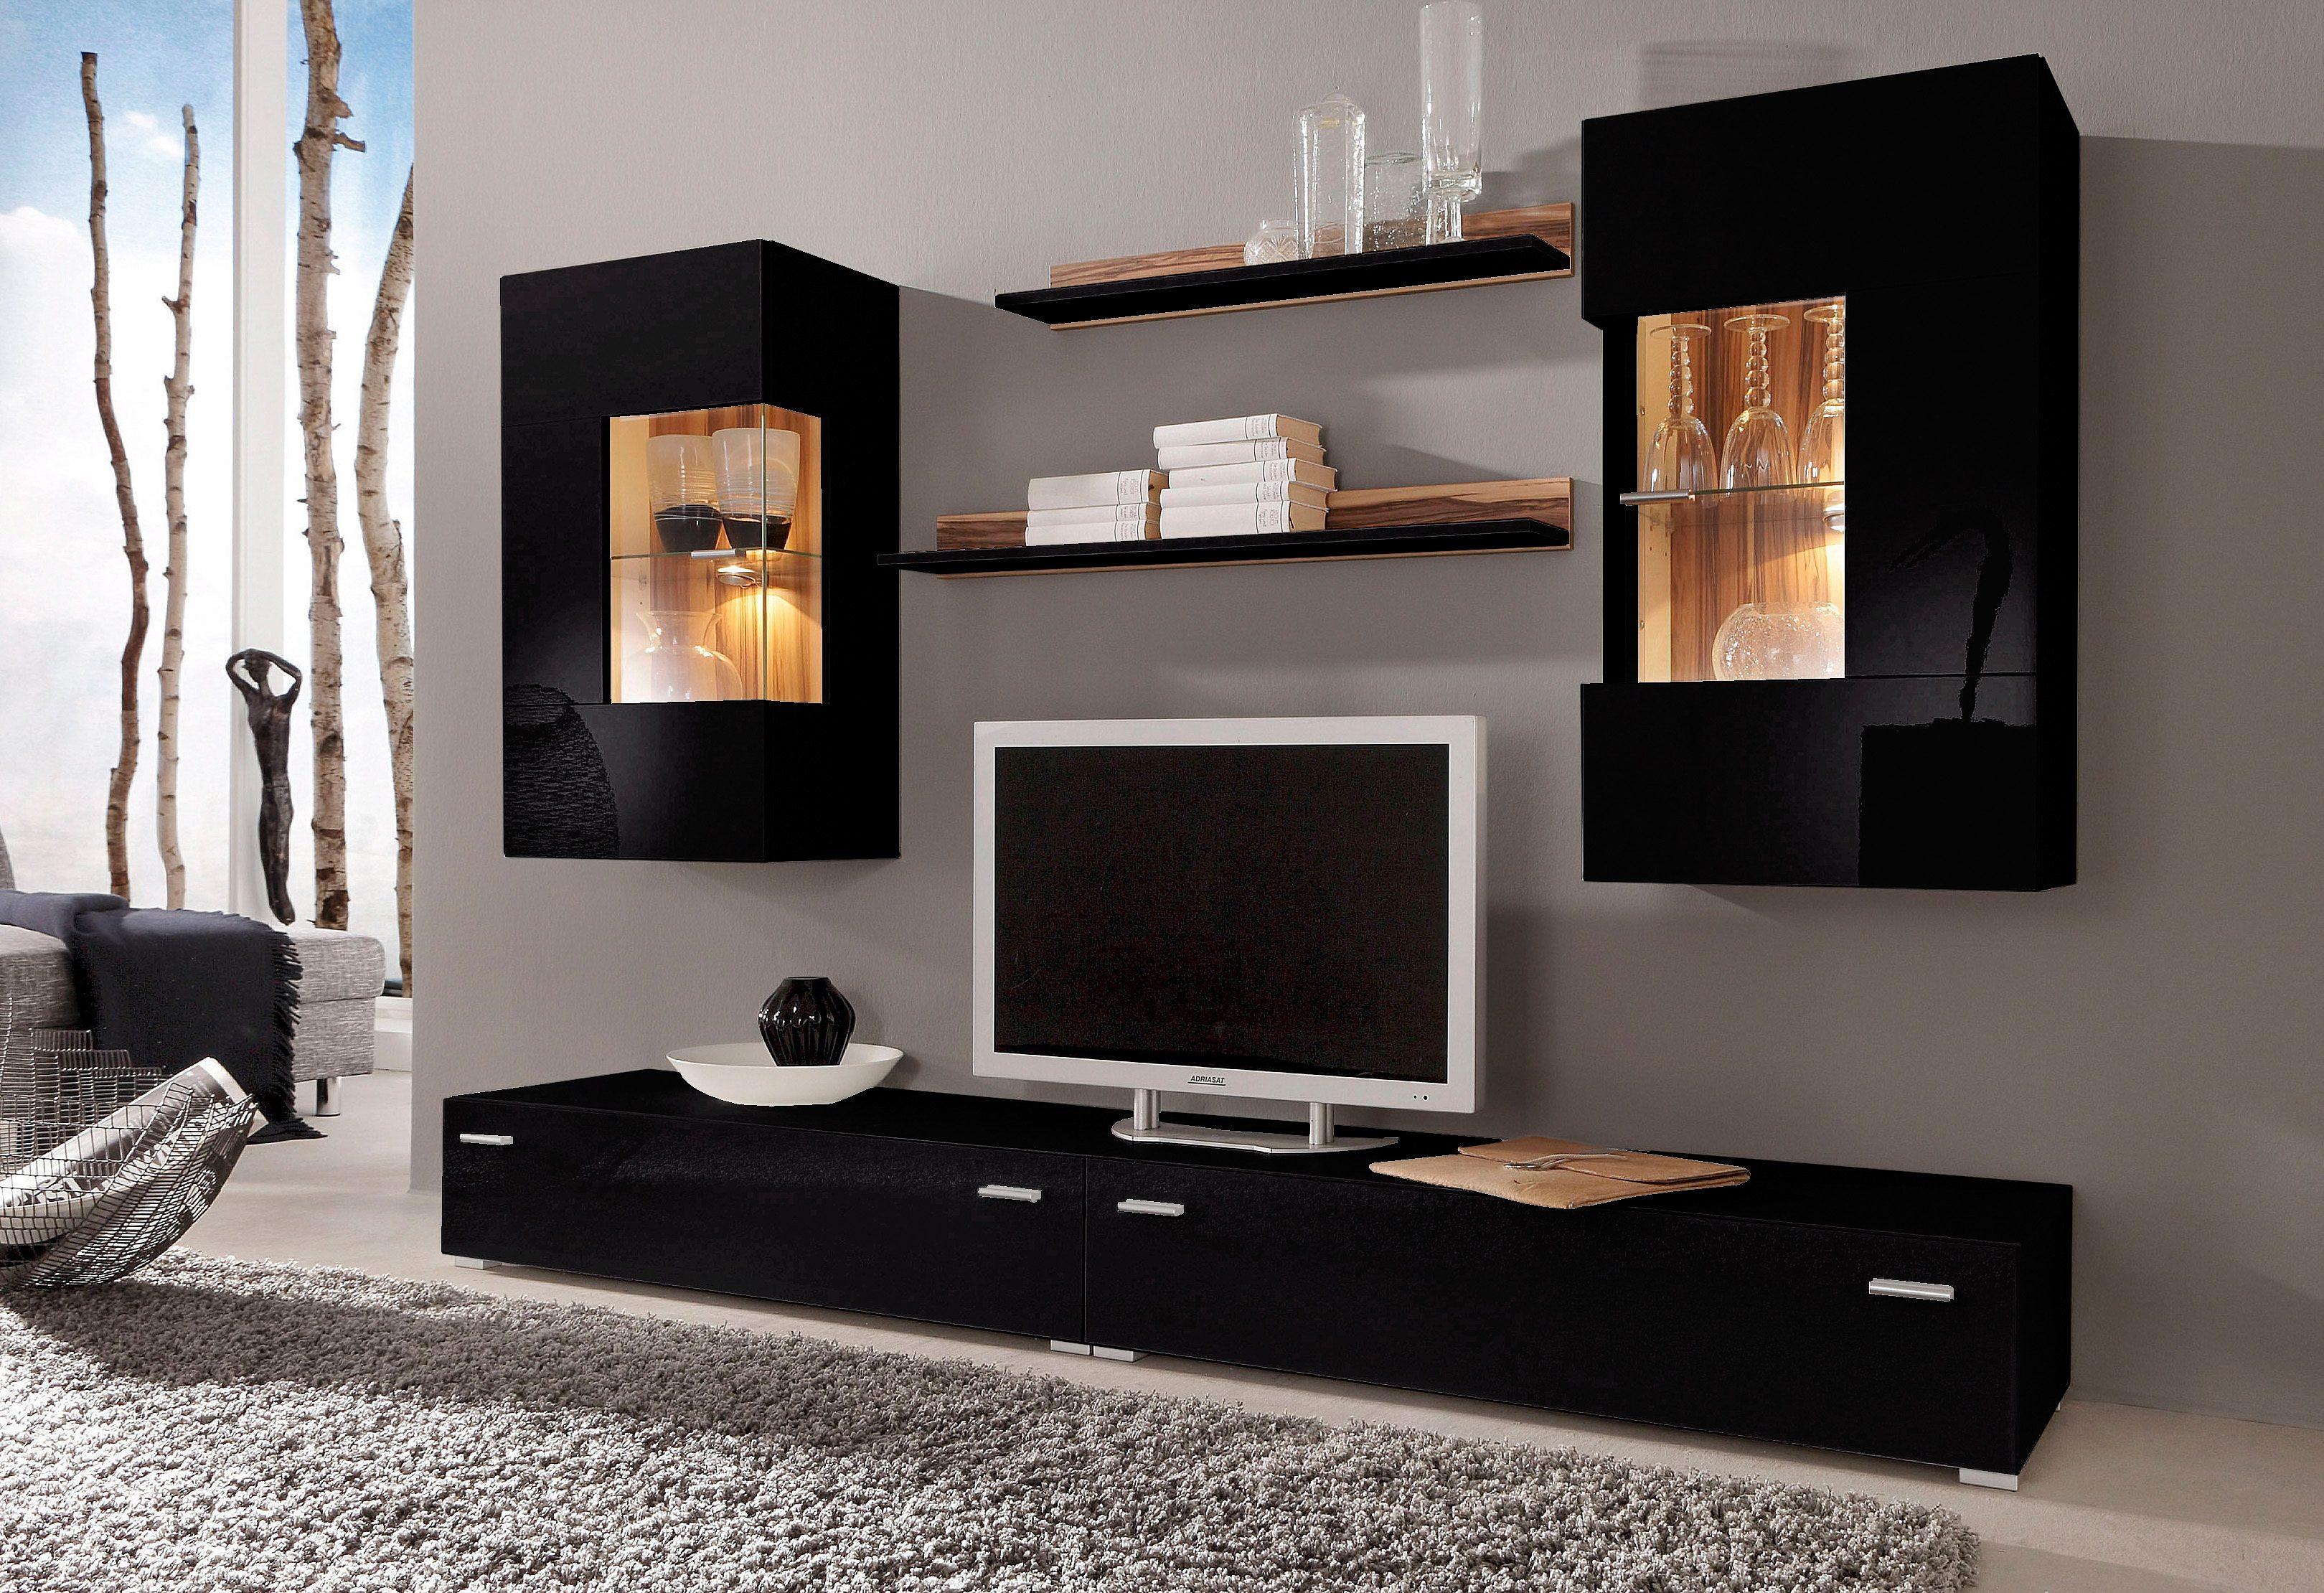 Kunststoff Wohnwande Online Kaufen Mobel Suchmaschine Ladendirekt De